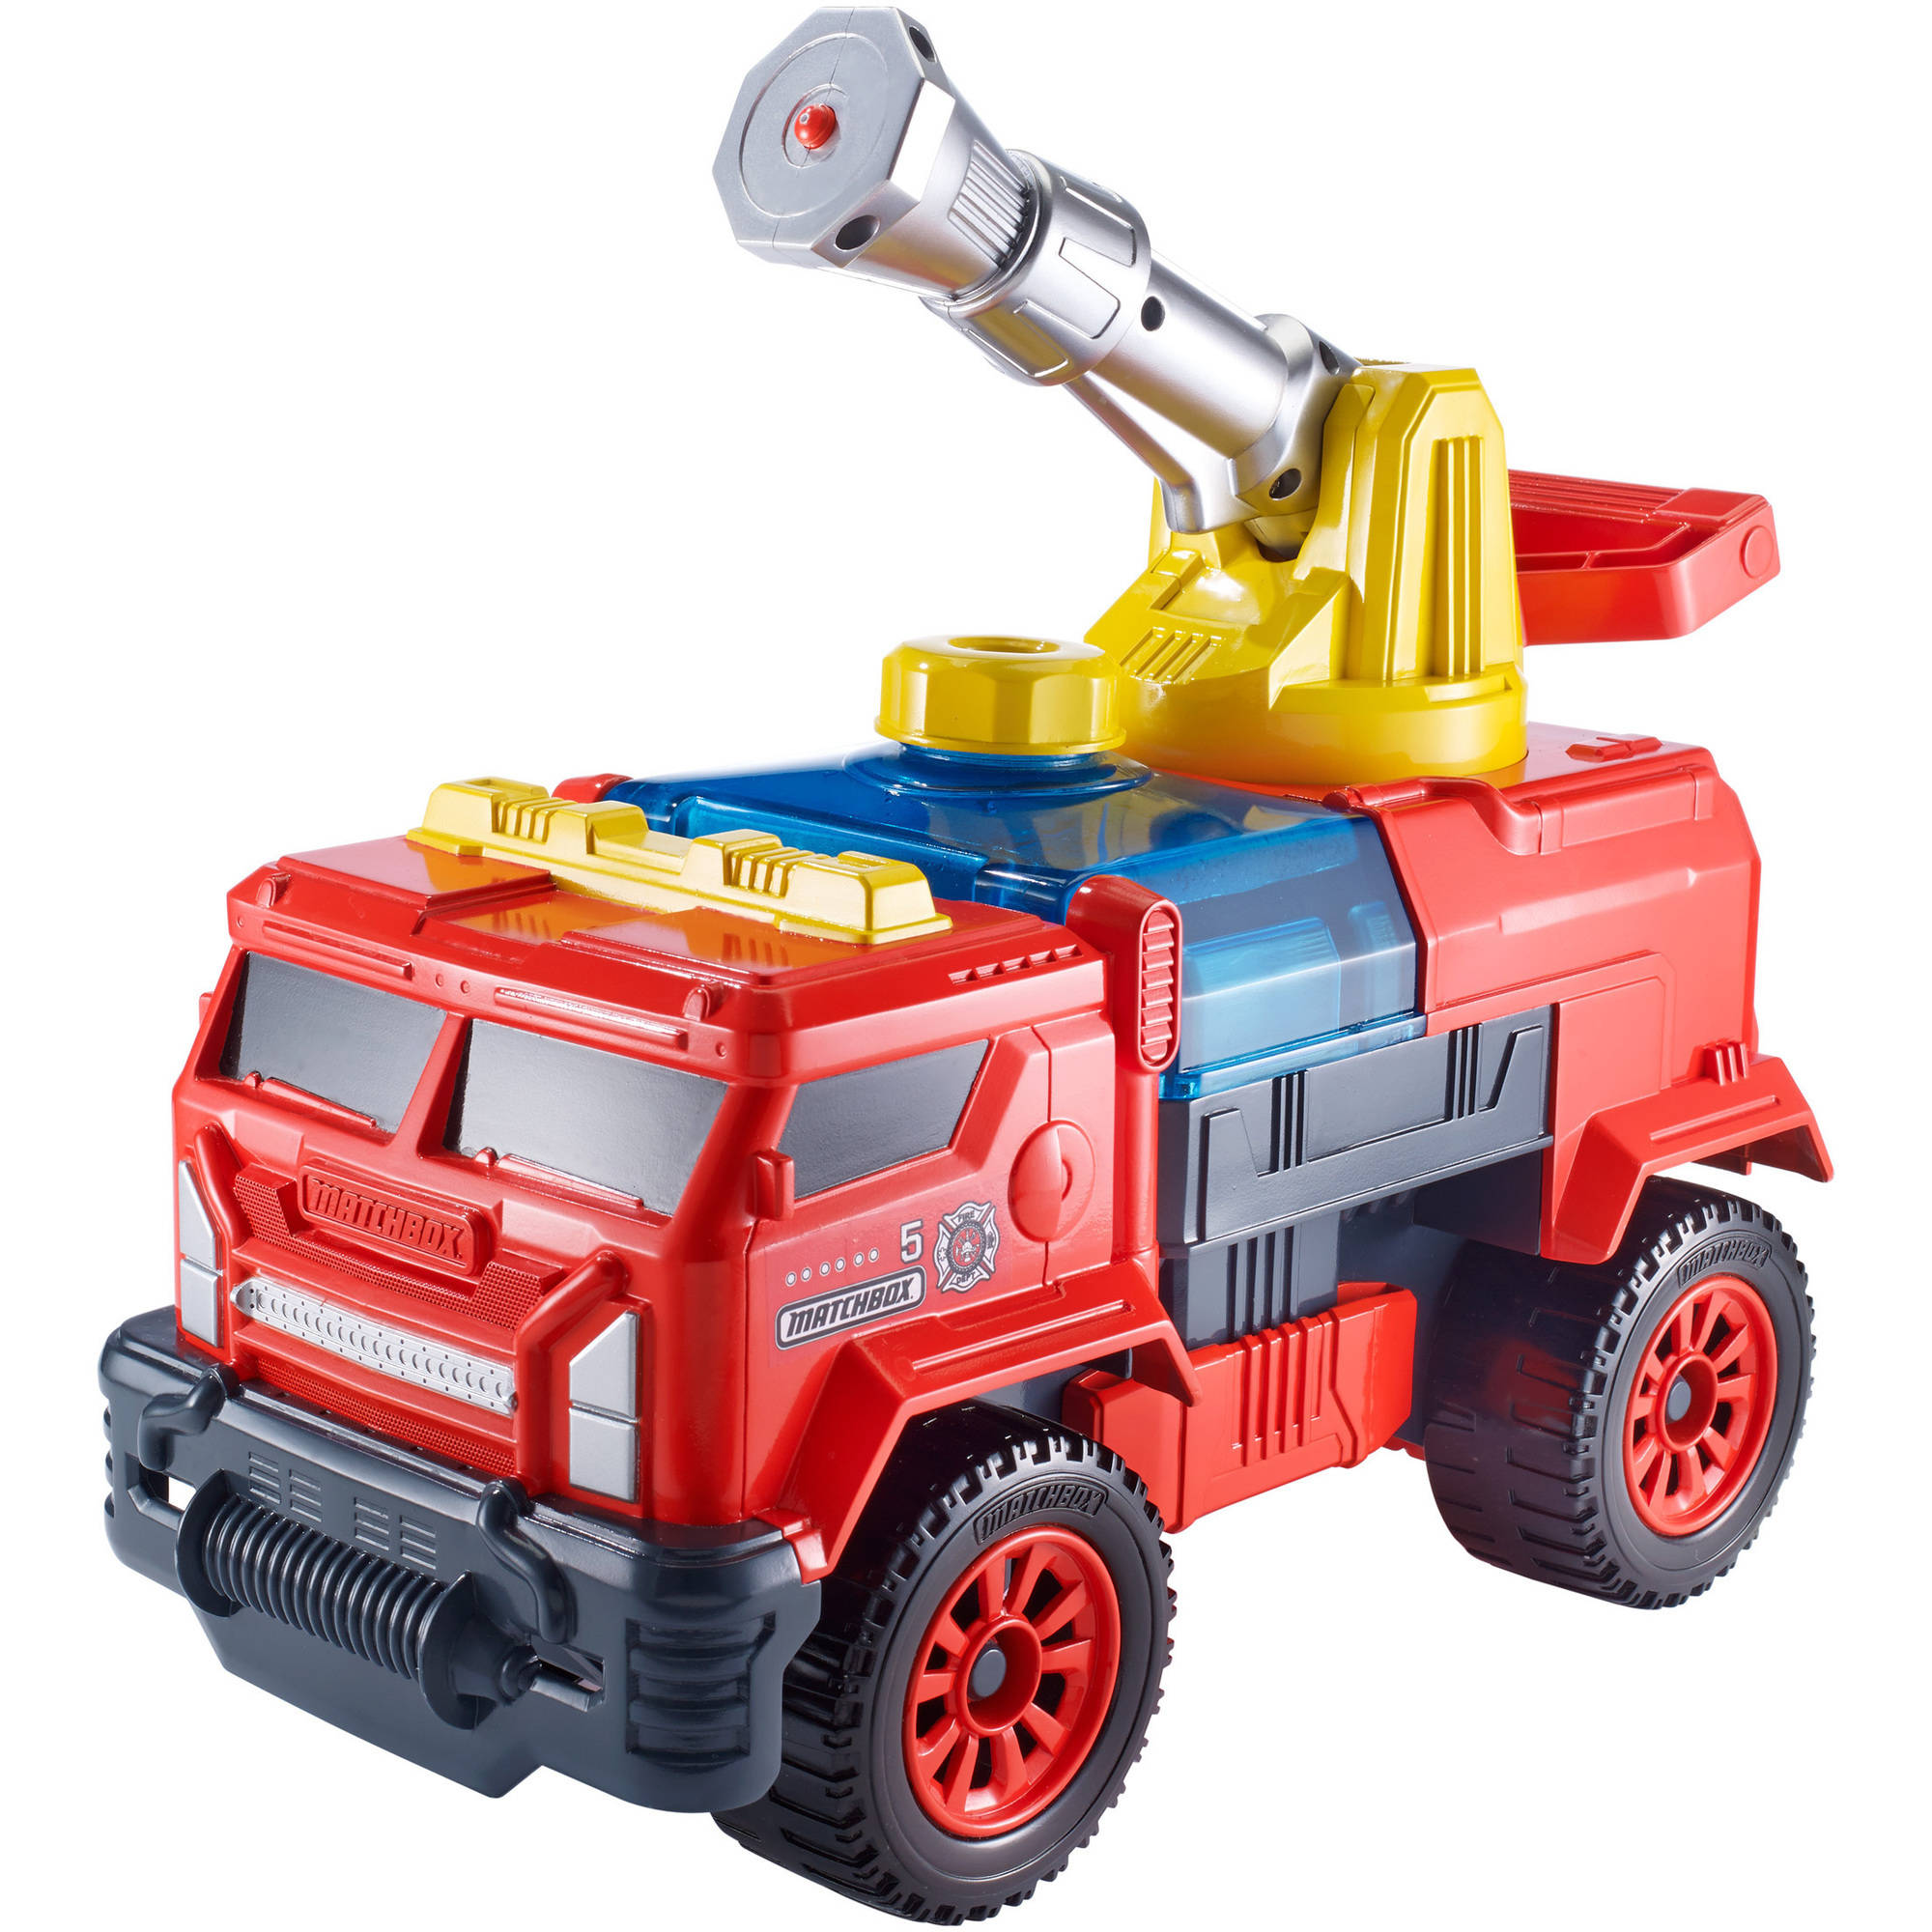 Matchbox Aqua Cannon Fire Truck